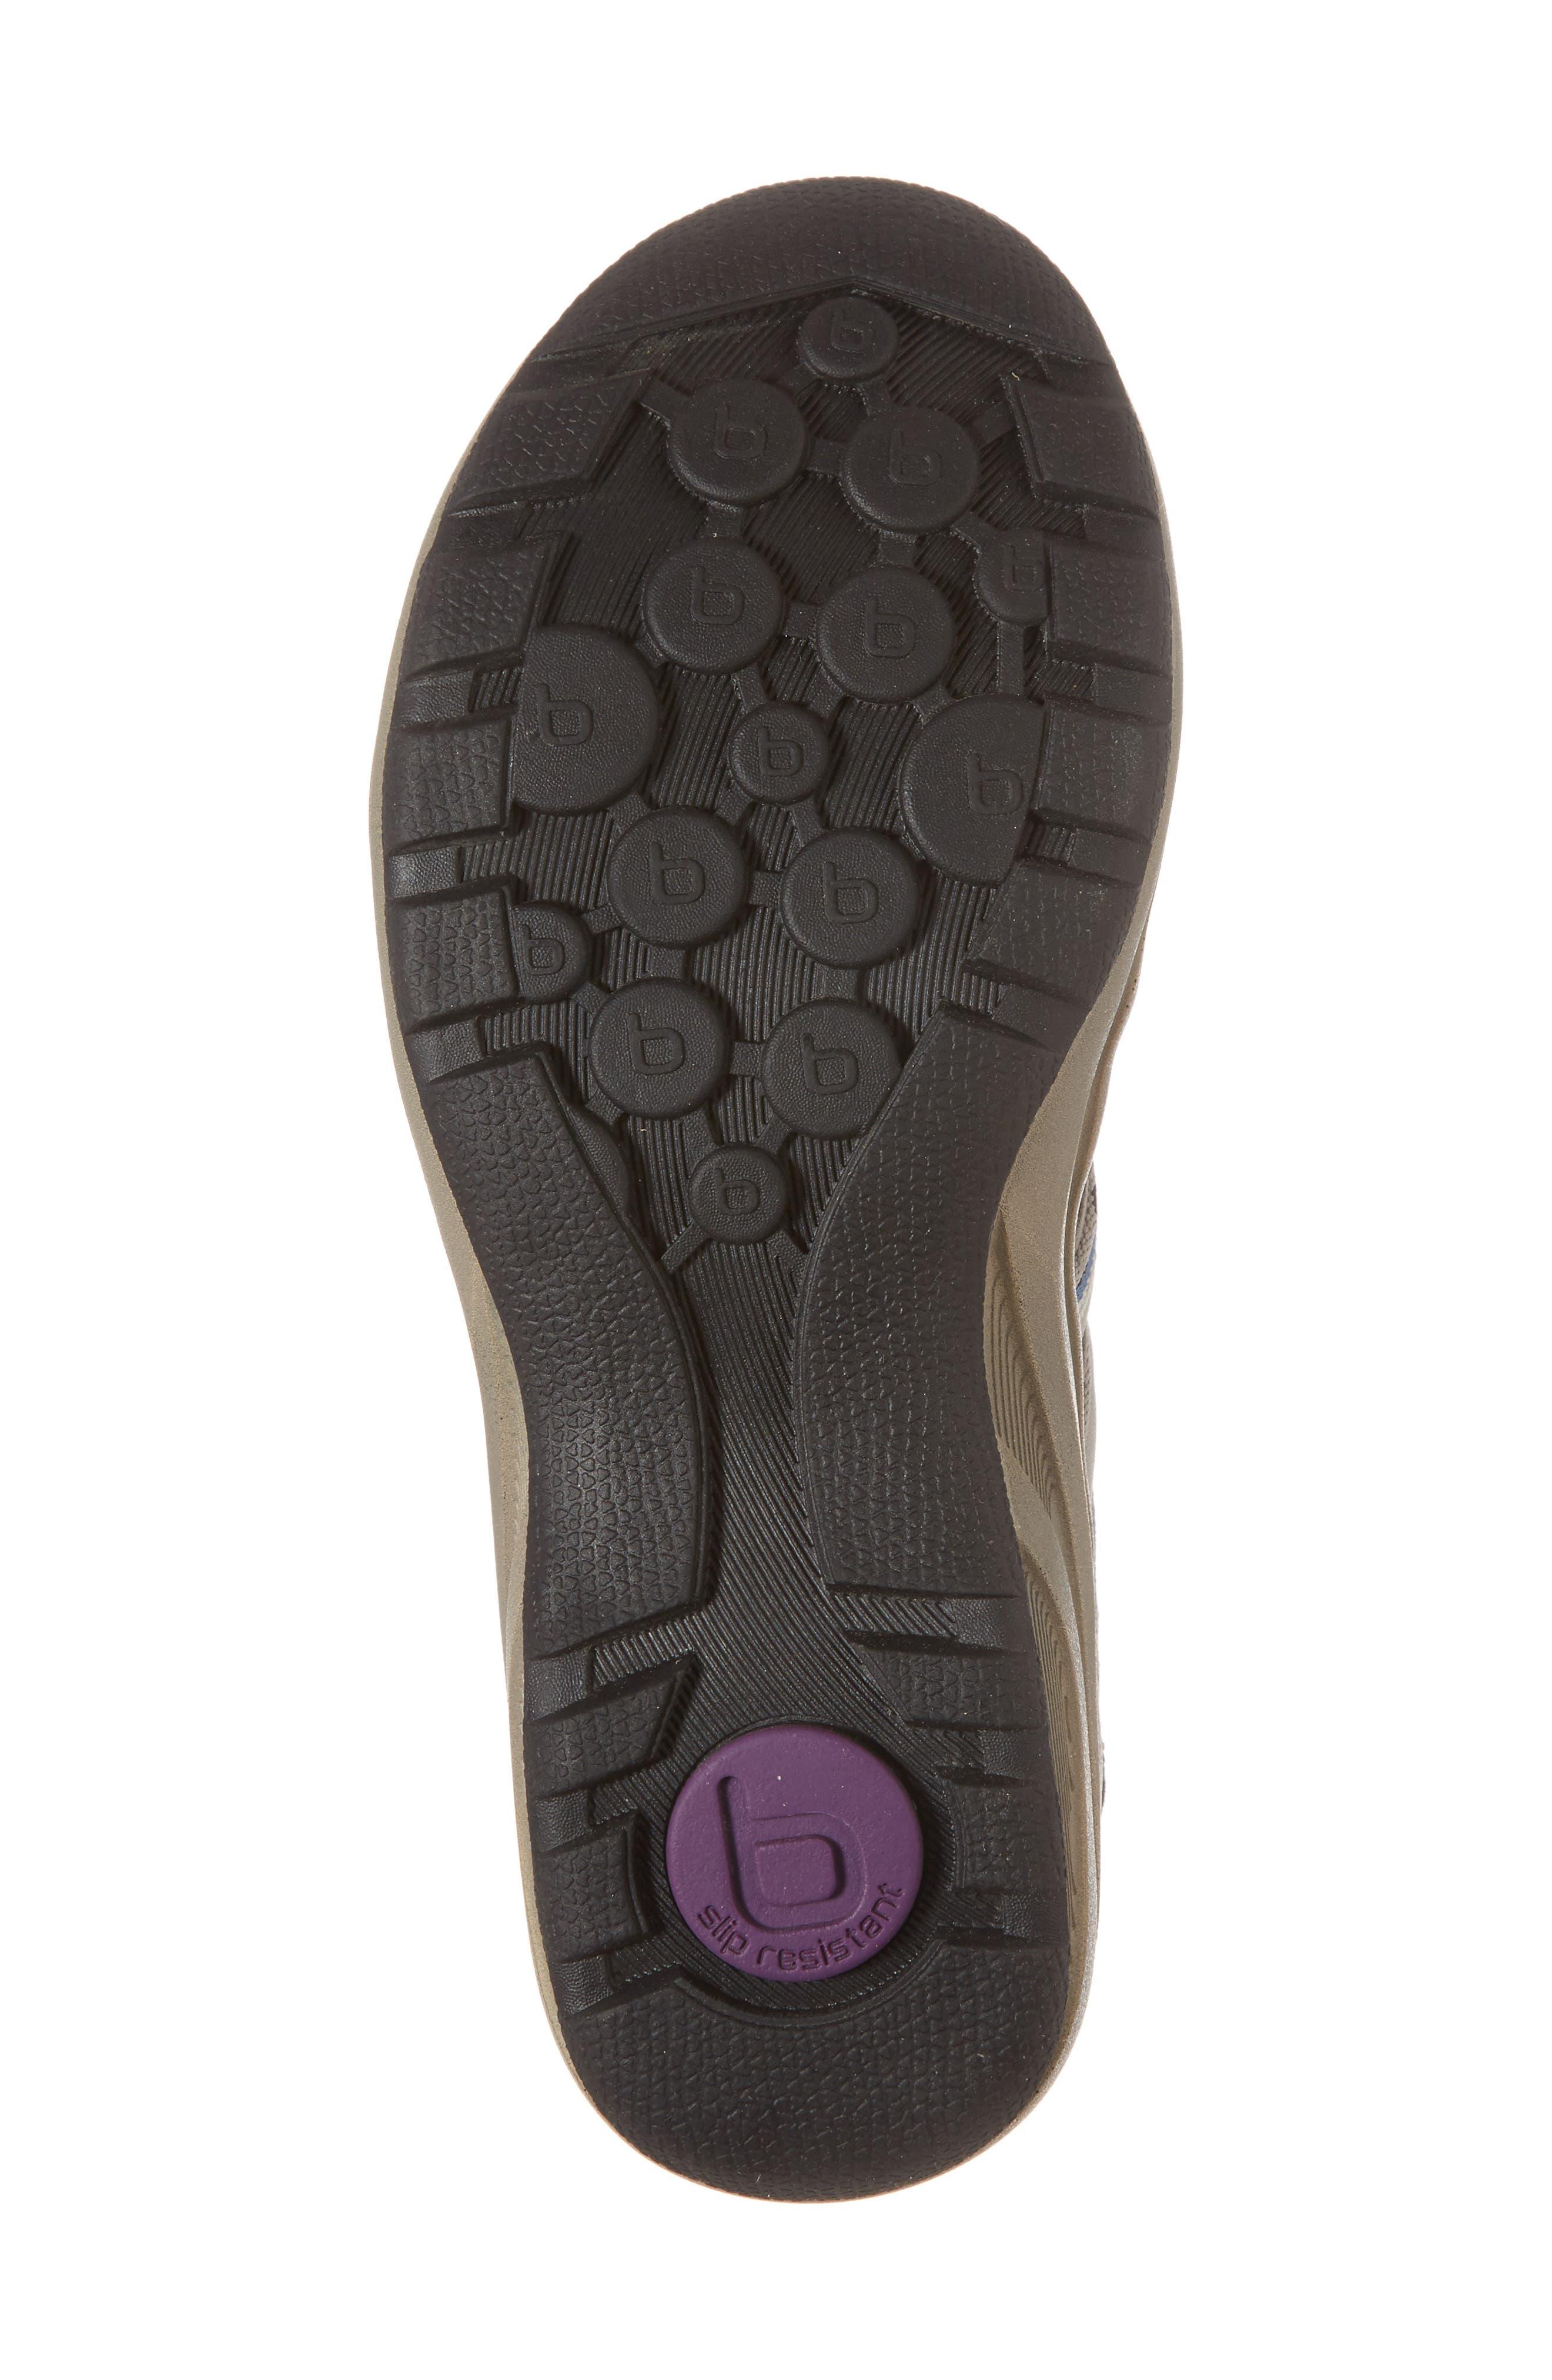 Malabar Sport Sandal,                             Alternate thumbnail 6, color,                             Paper Mache Leather